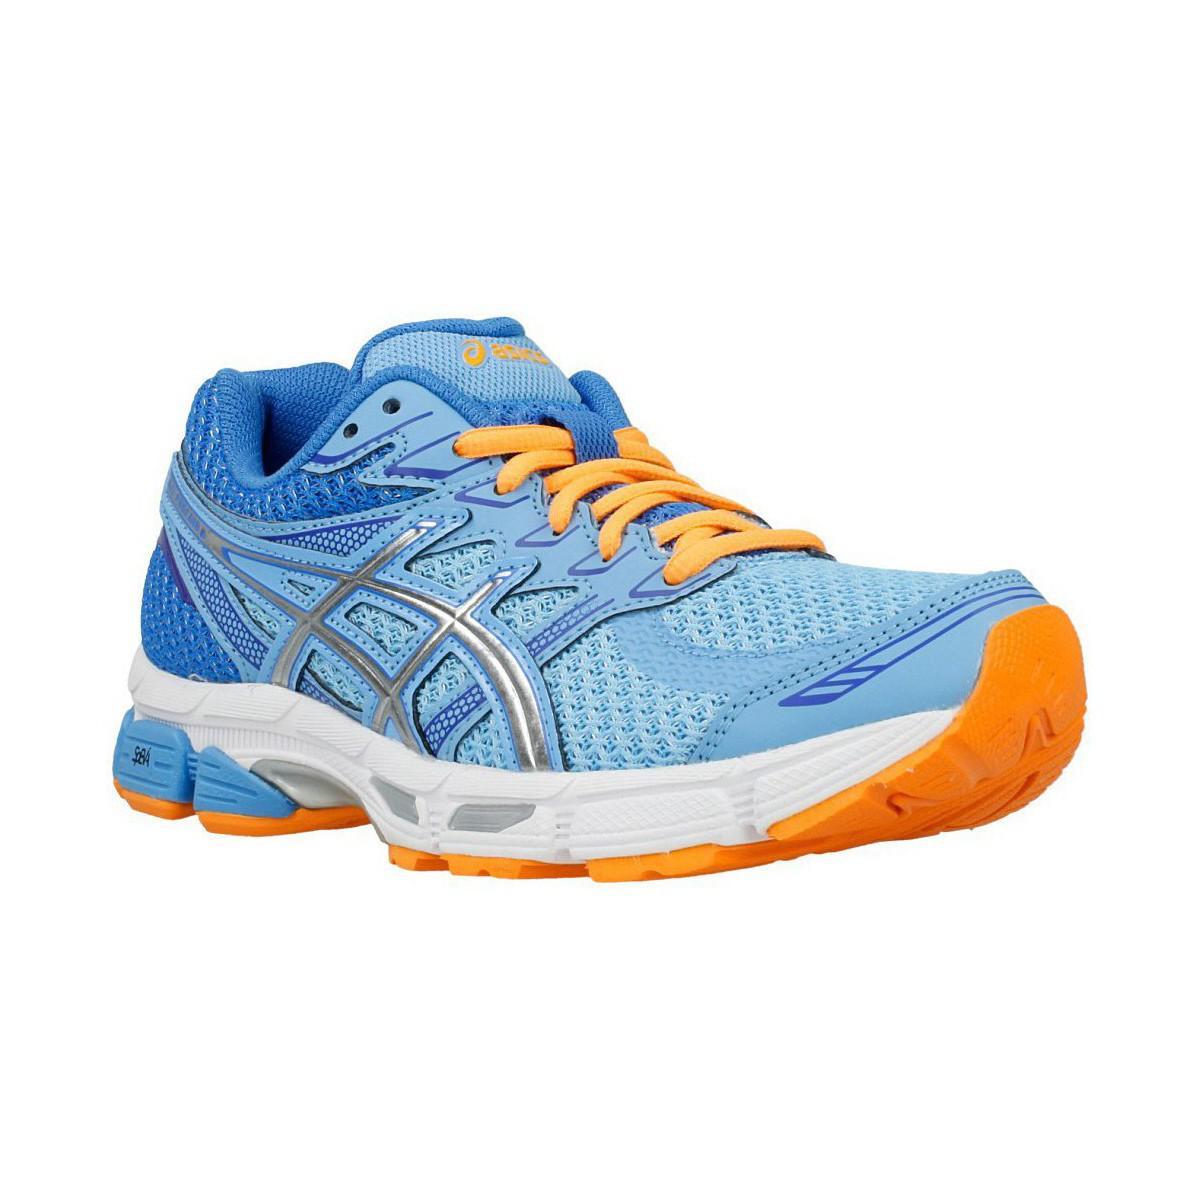 code promo 3a77c 5156c Asics Gel Phoenix 6 Women's Running Trainers In Blue in ...